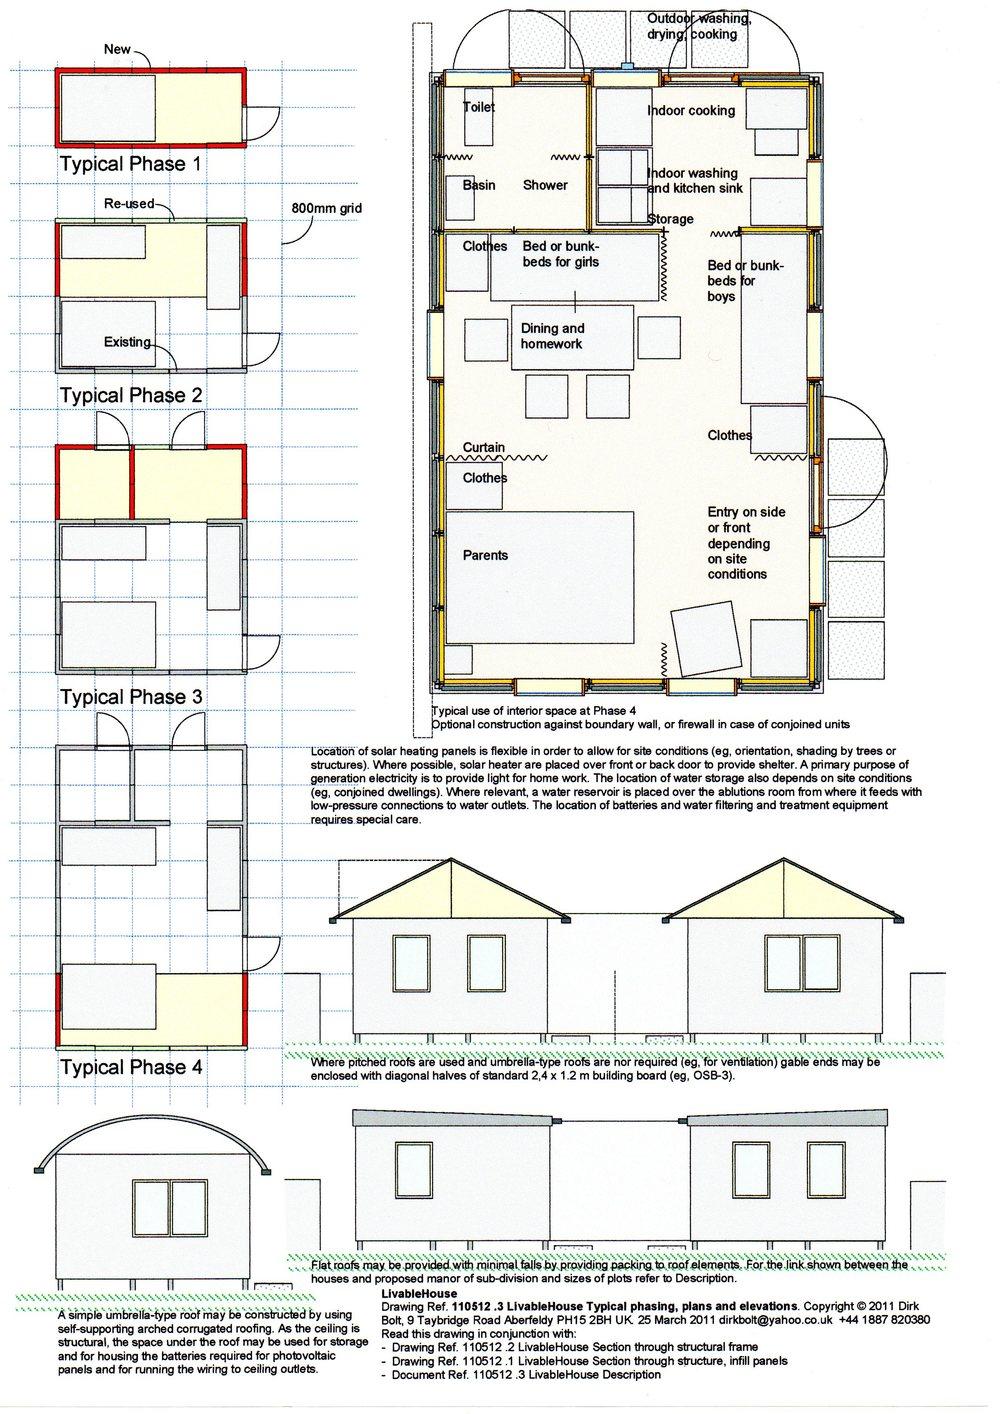 110525 3 livablehouse typical phasing plans elevations image 3 bigger